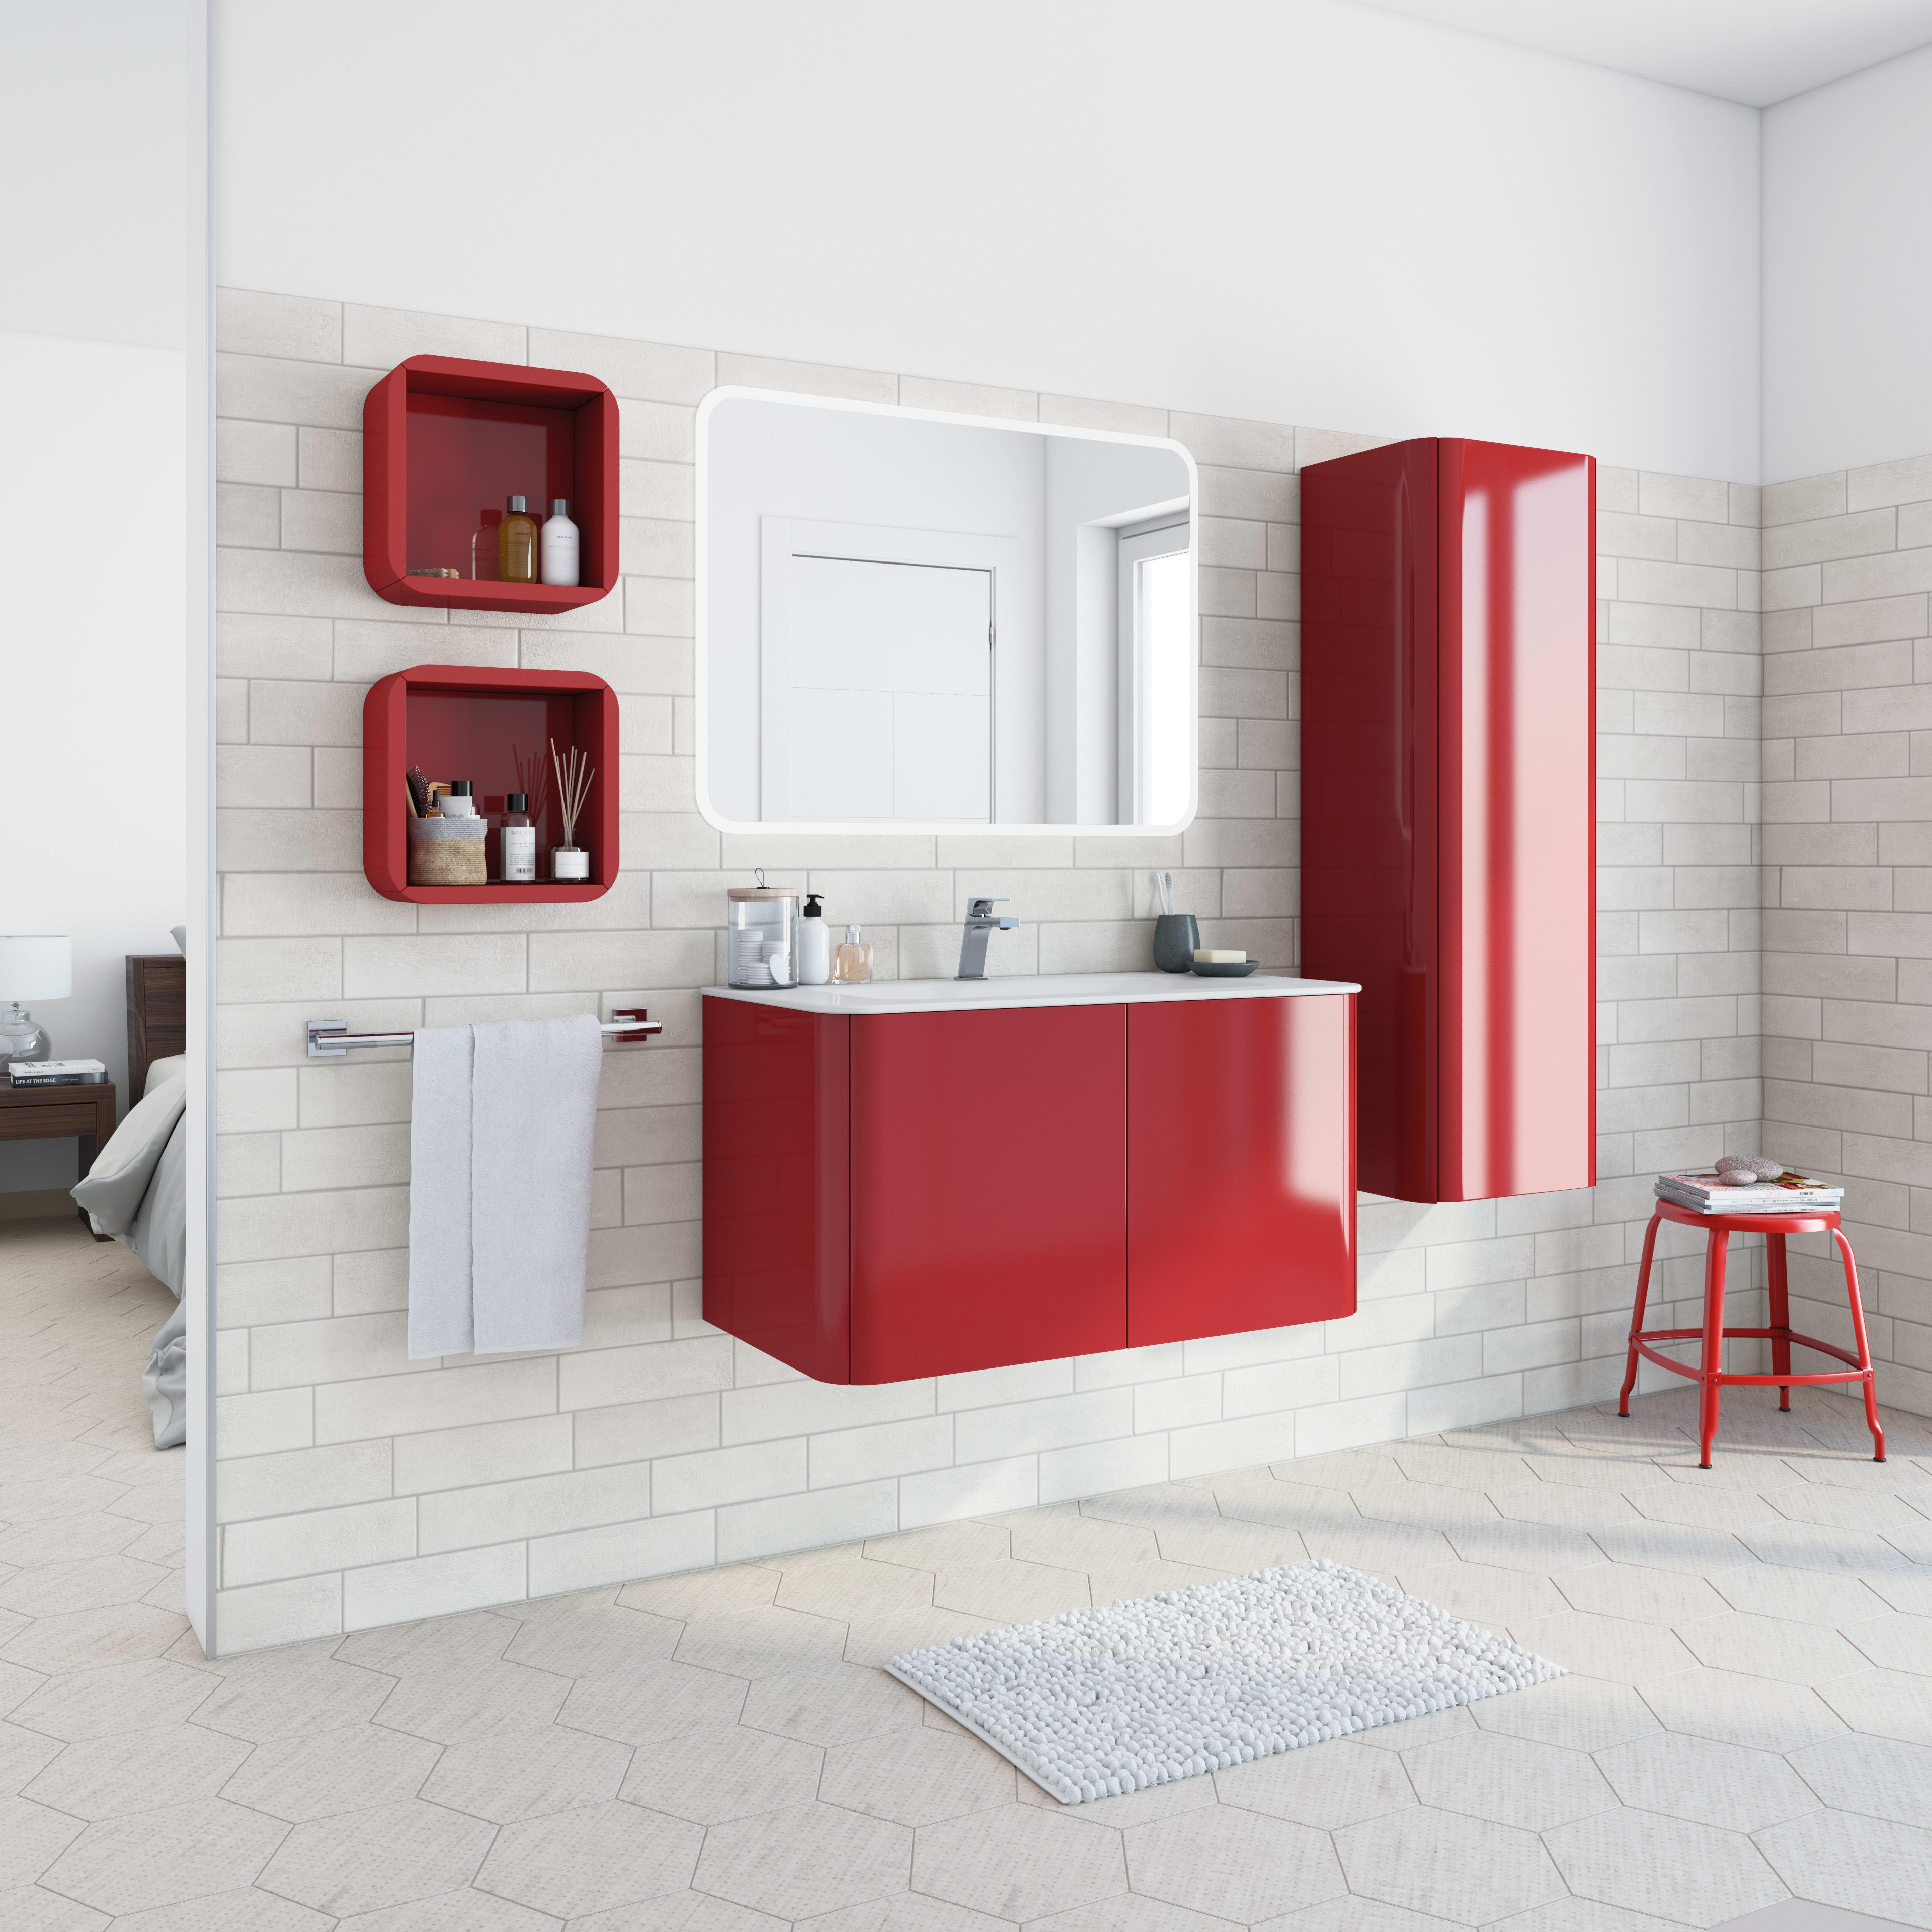 Bagni Leroy Merlin Catalogo mobile bagno liverpool rosso l 94 cm